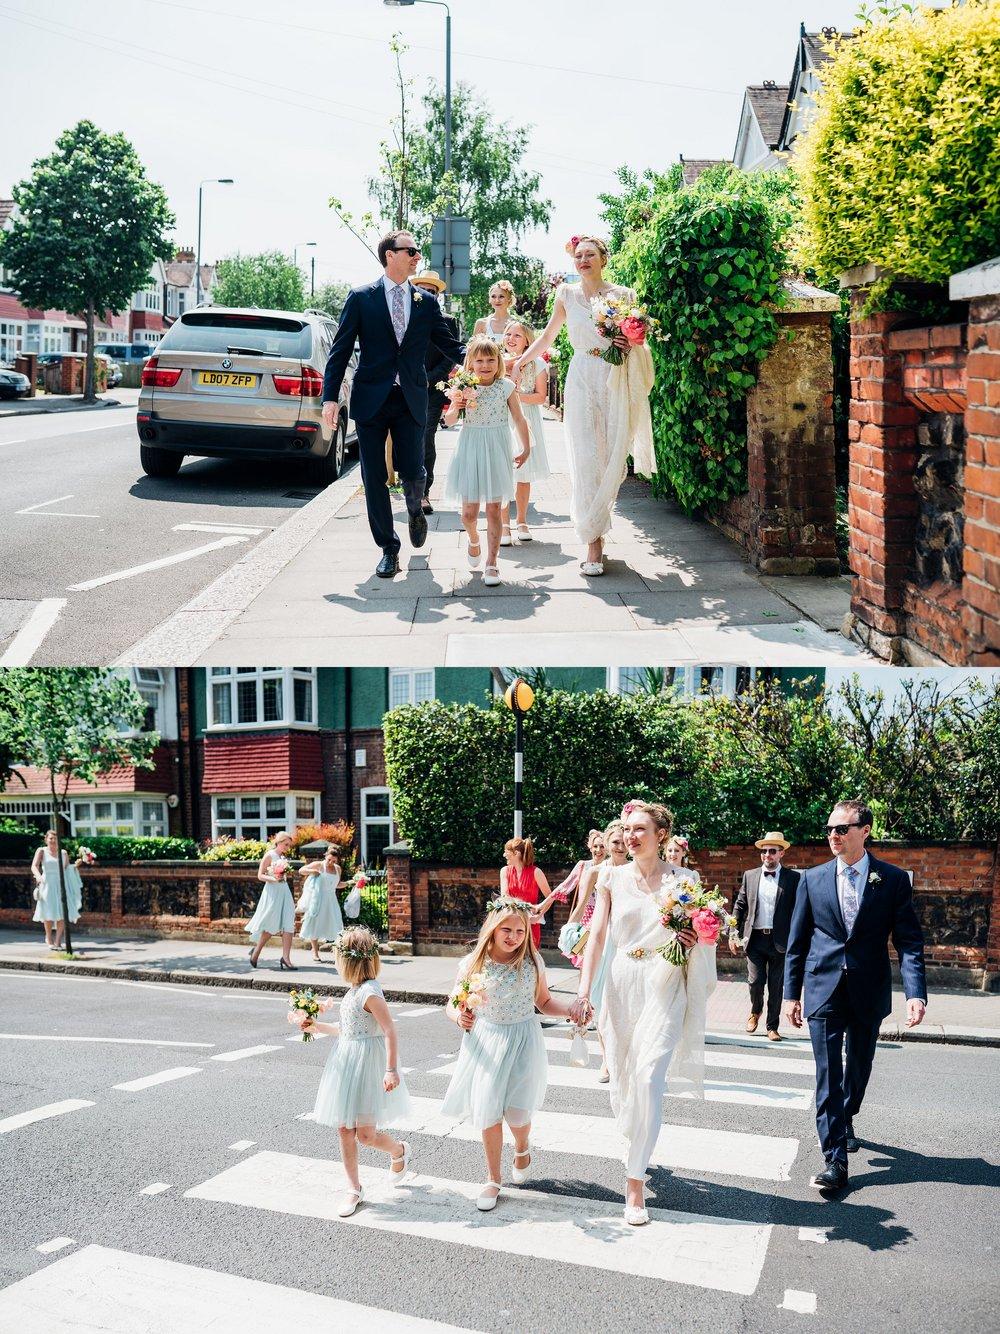 ALTERNATIVE KEW GARDEN AND BIG RED BUS LONDON WEDDING_0013.jpg